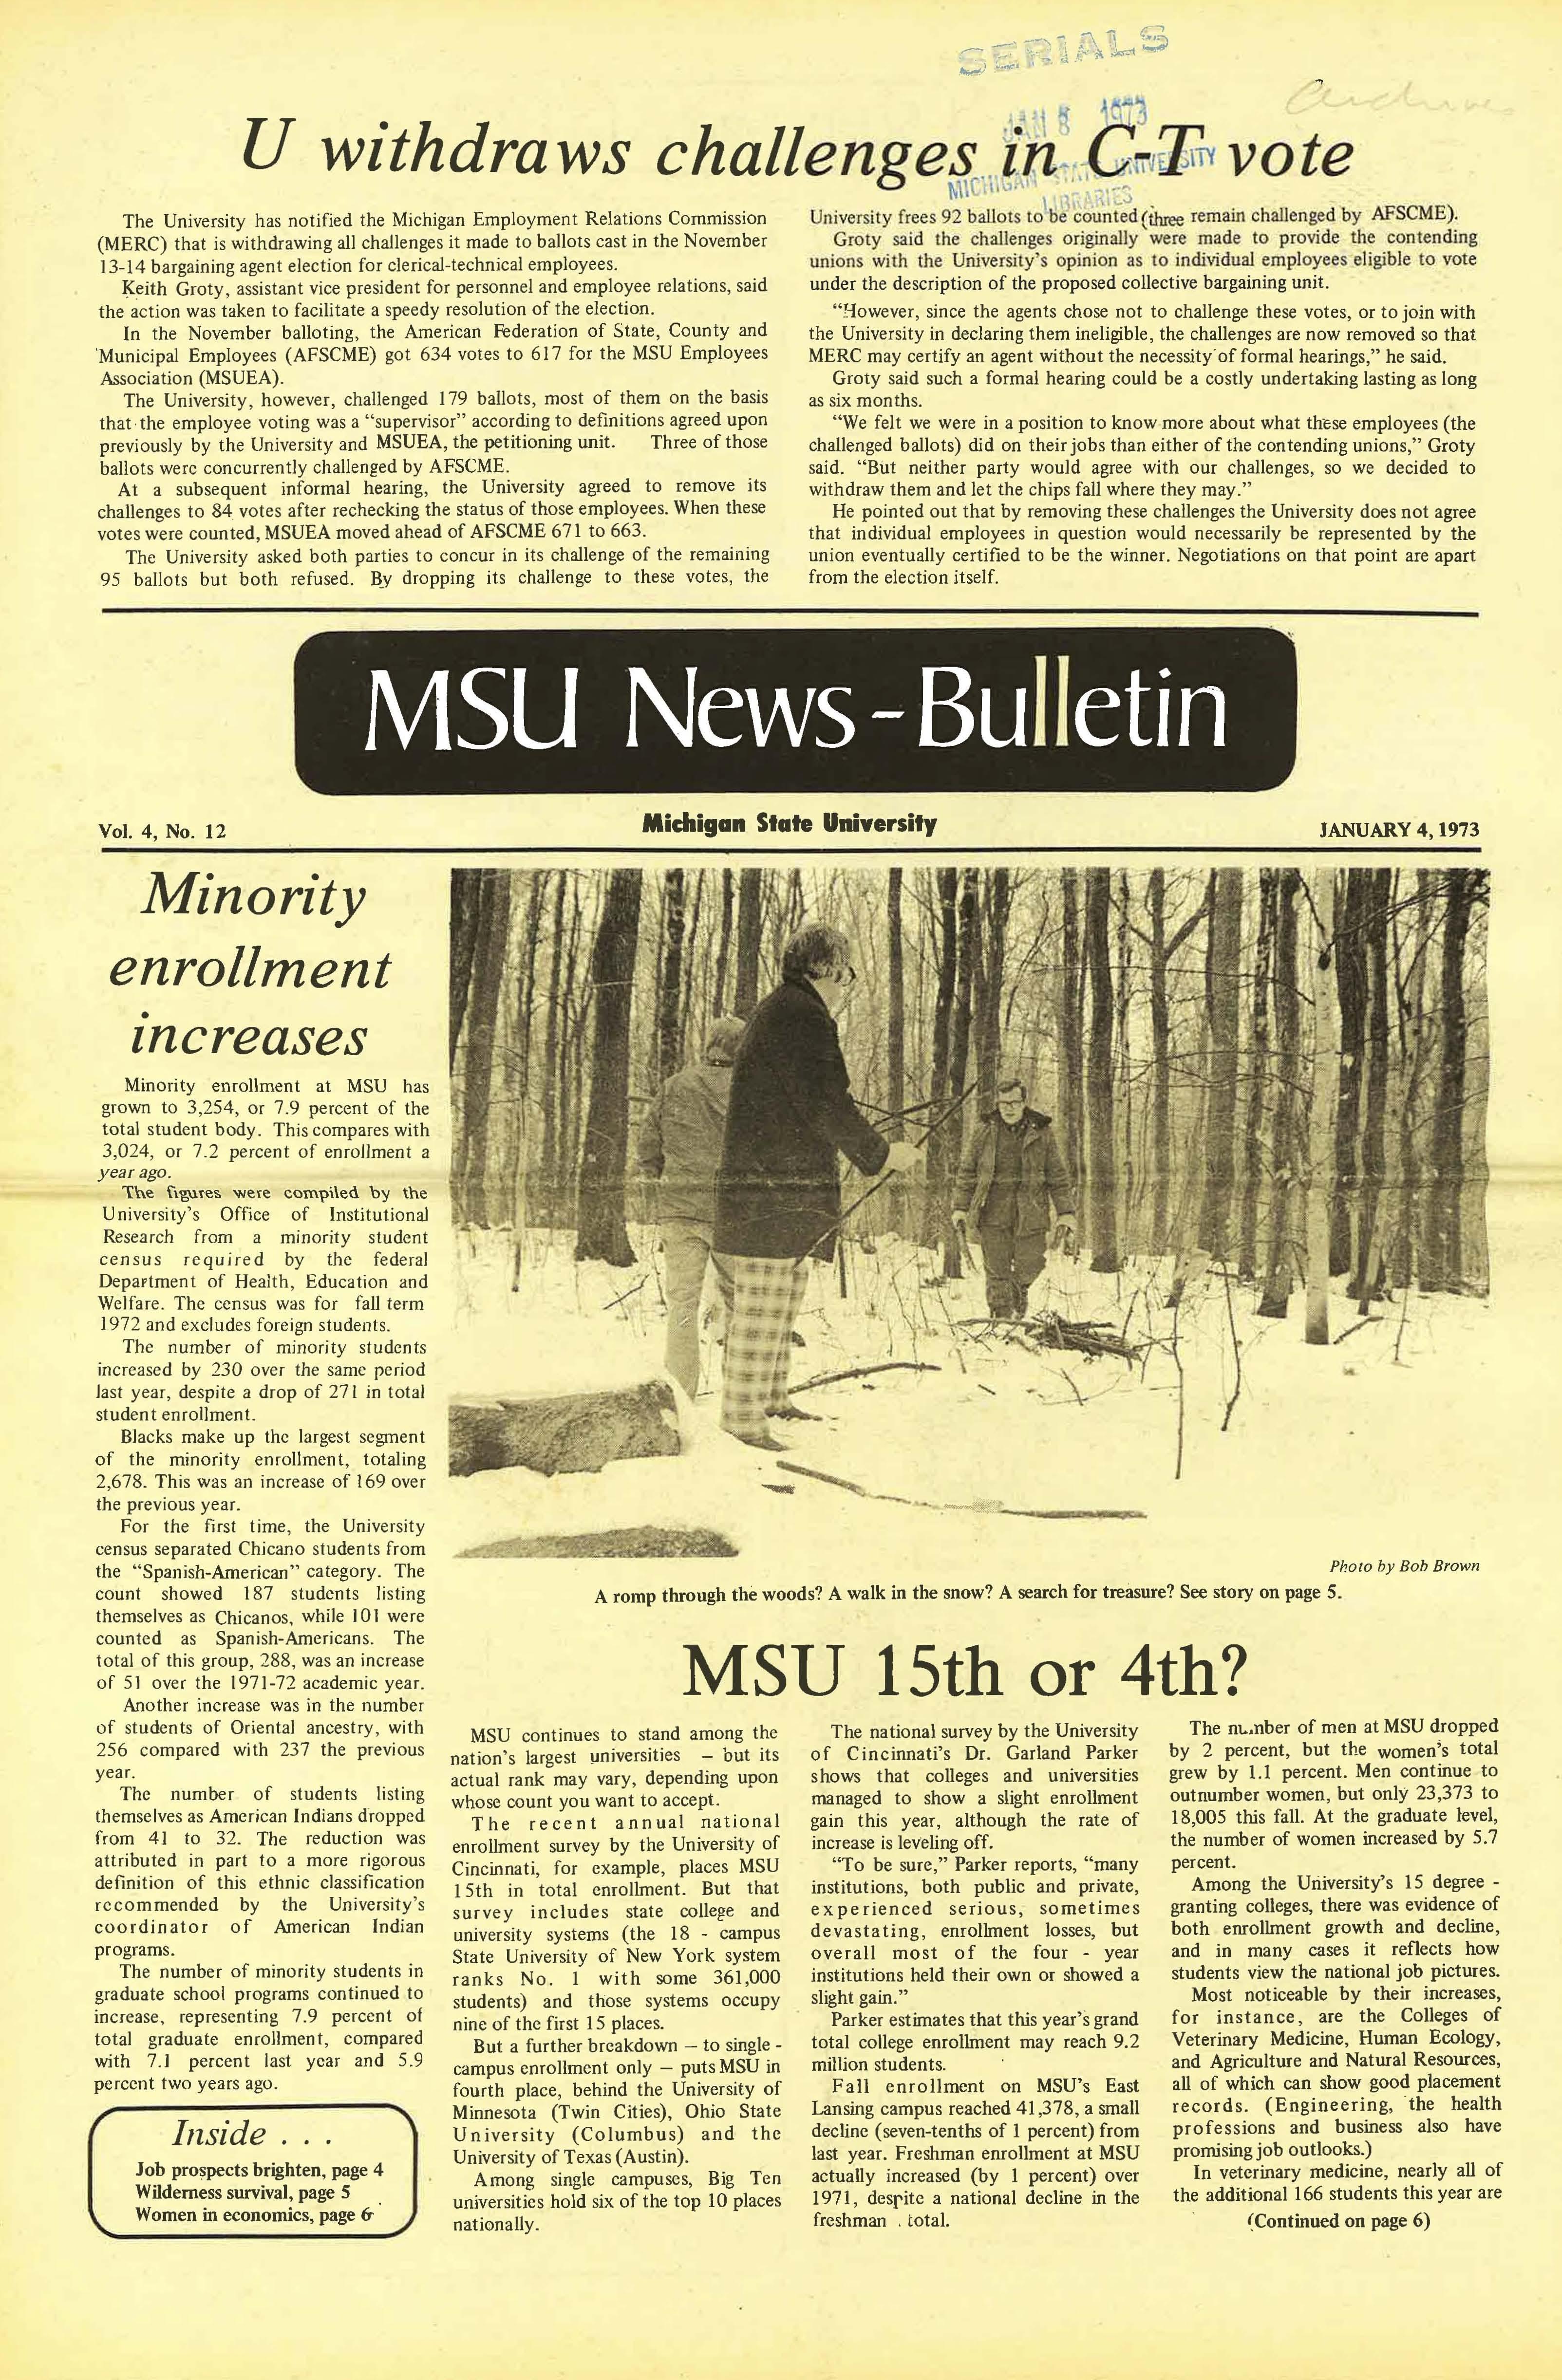 MSU News Bulletin, vol. 4, No. 13, January 11, 1973